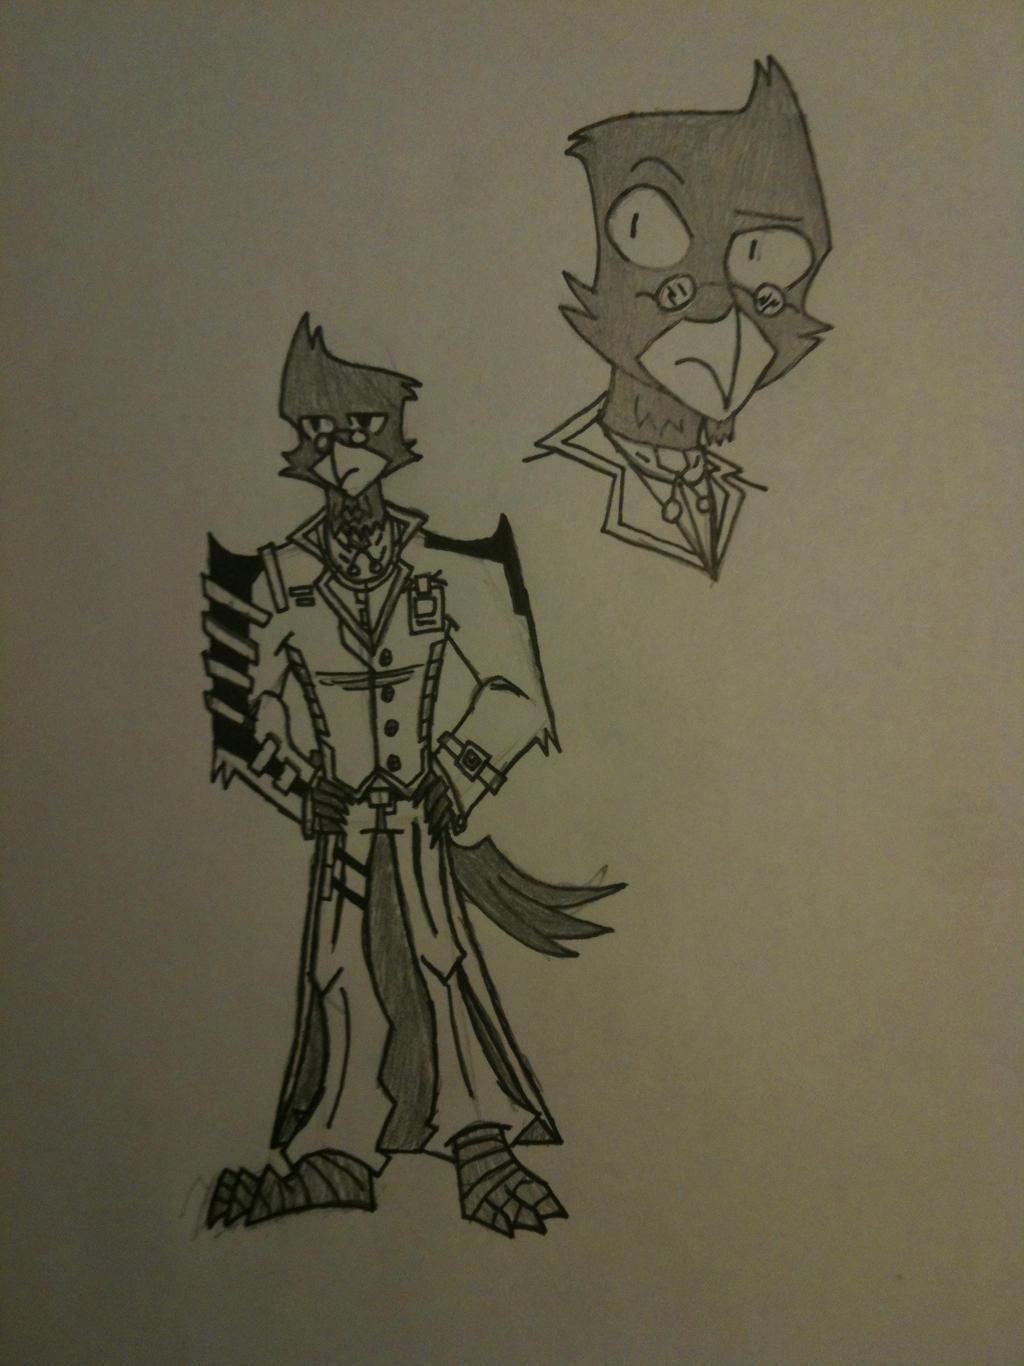 Talon by thedestoryerofworlds